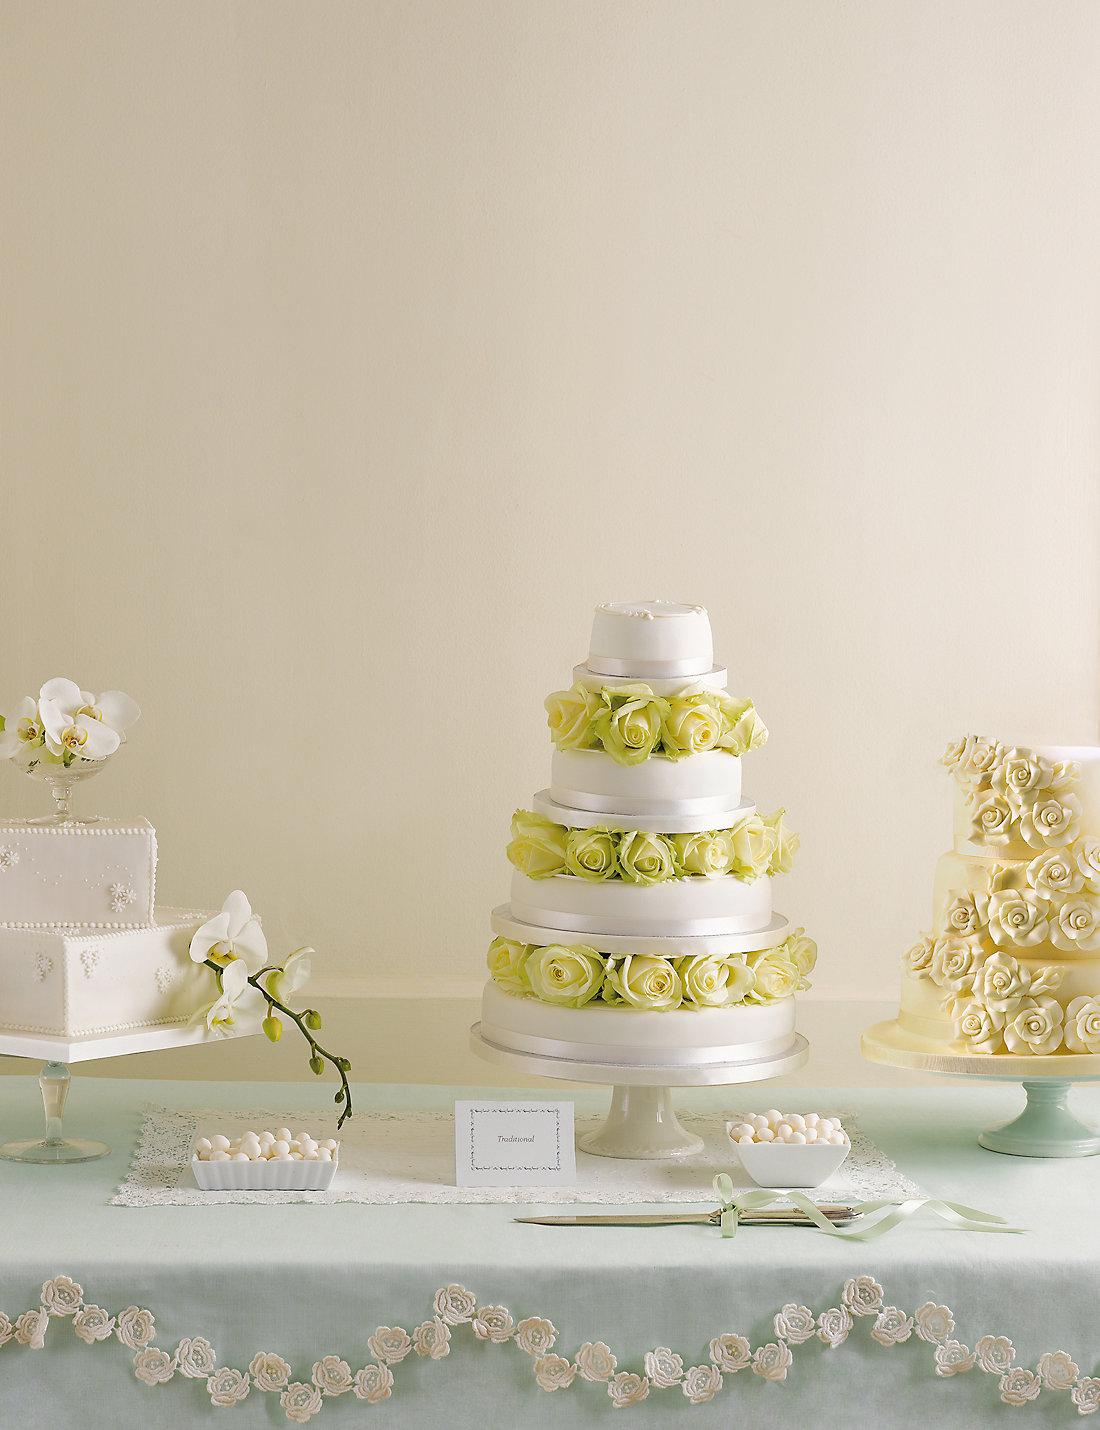 8 White Pillars Dowels Wedding Cake Accessories M S